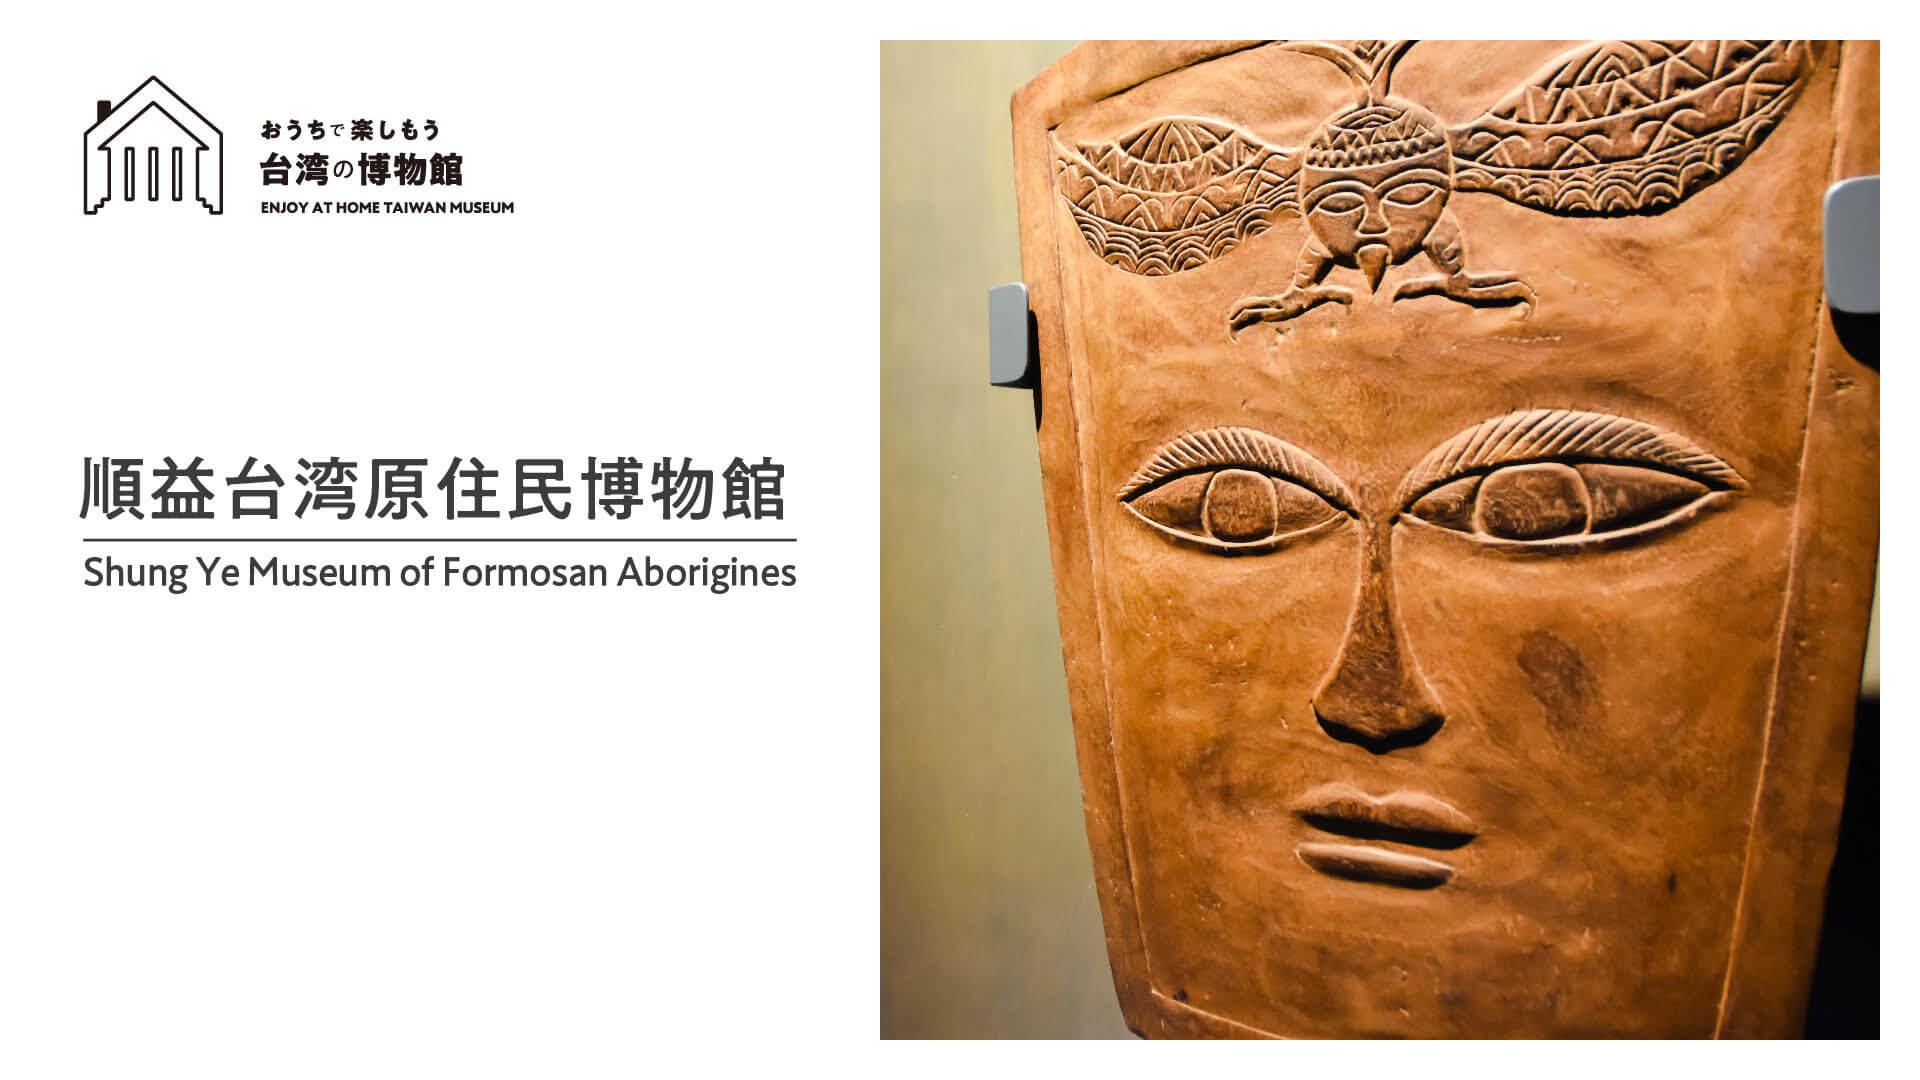 SNET台湾チャンネル『おうちで楽しもう台湾の博物館』第8回 順益台湾原住民博物館 配信